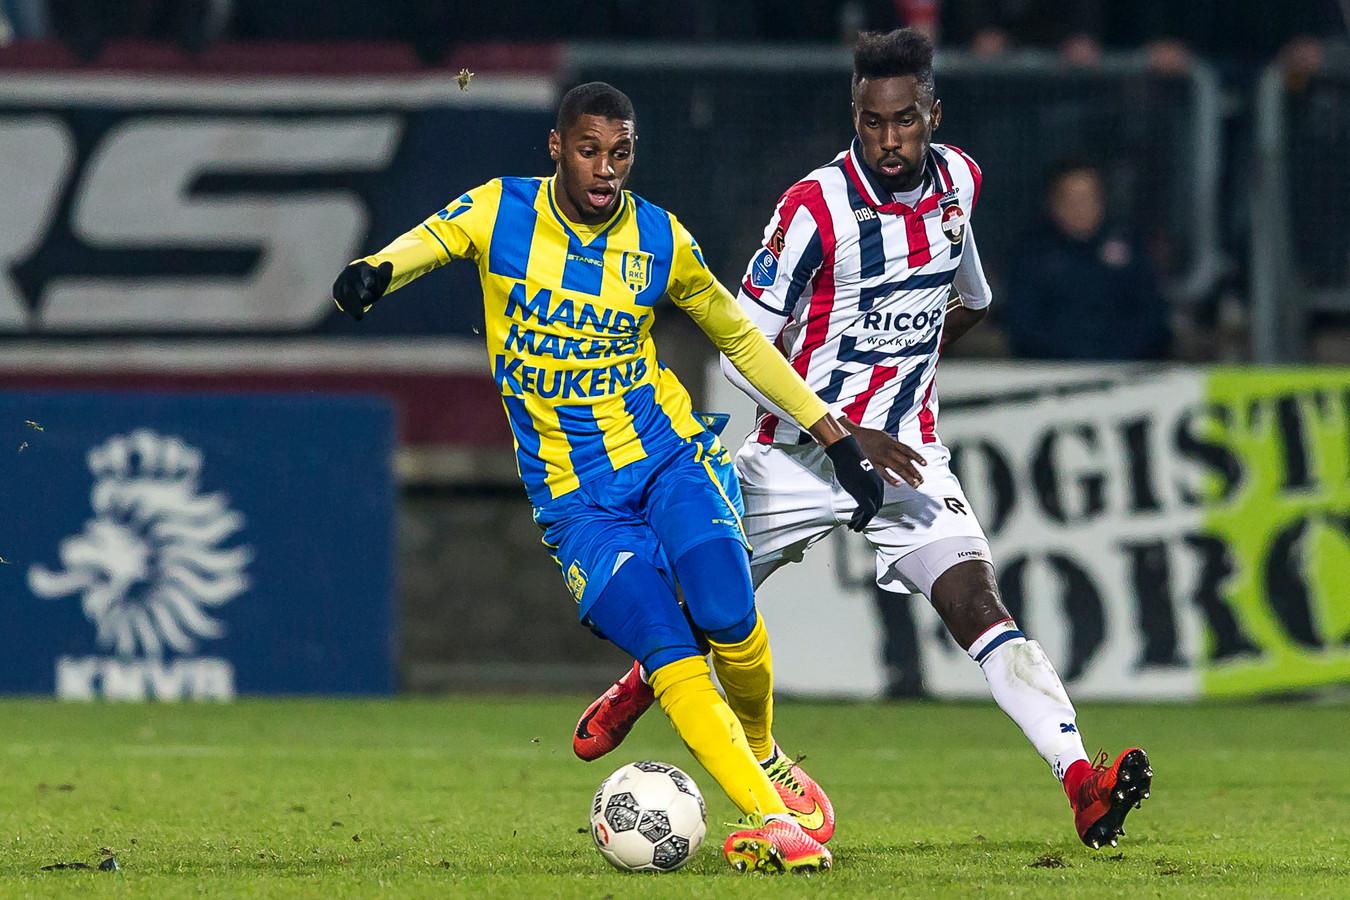 Said Bakari duelleert in het bekerduel met Willem II met verdediger Fernando Lewis van de Tilburgse club.